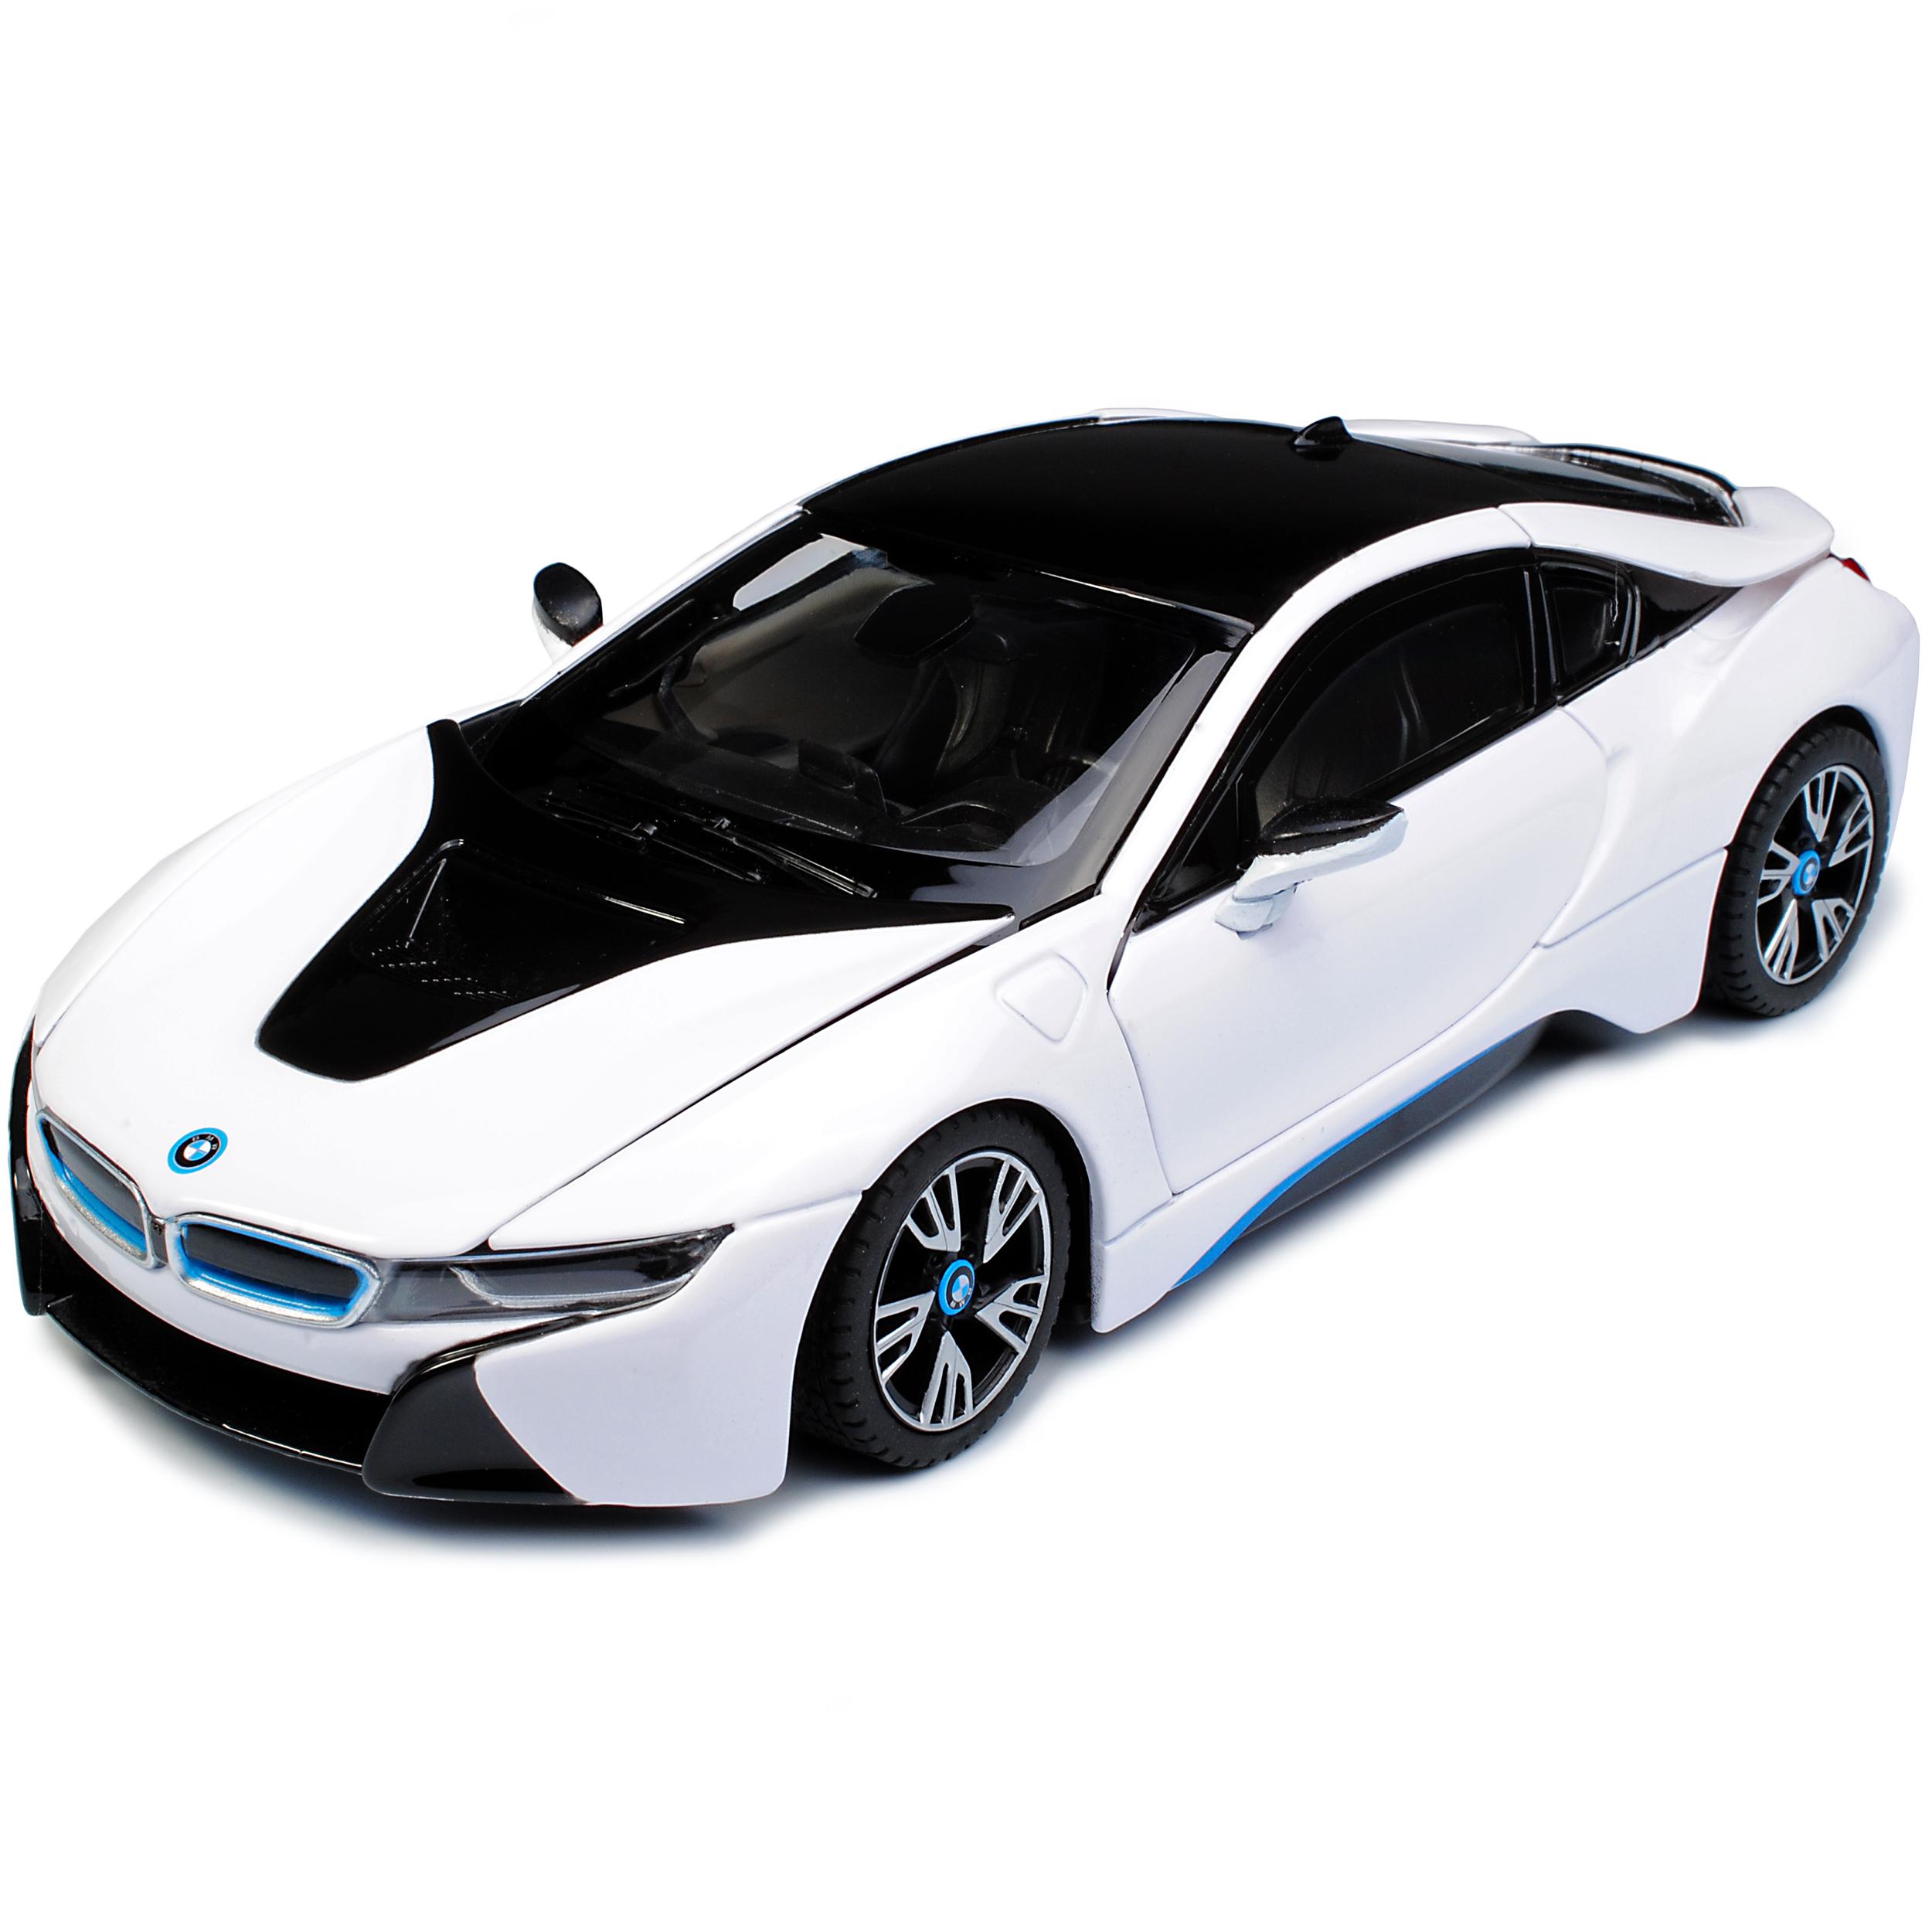 BMW I8 Coupe Weiss Ab 2013 1//24 Rastar Modell Auto mit oder ohne individiuelle..